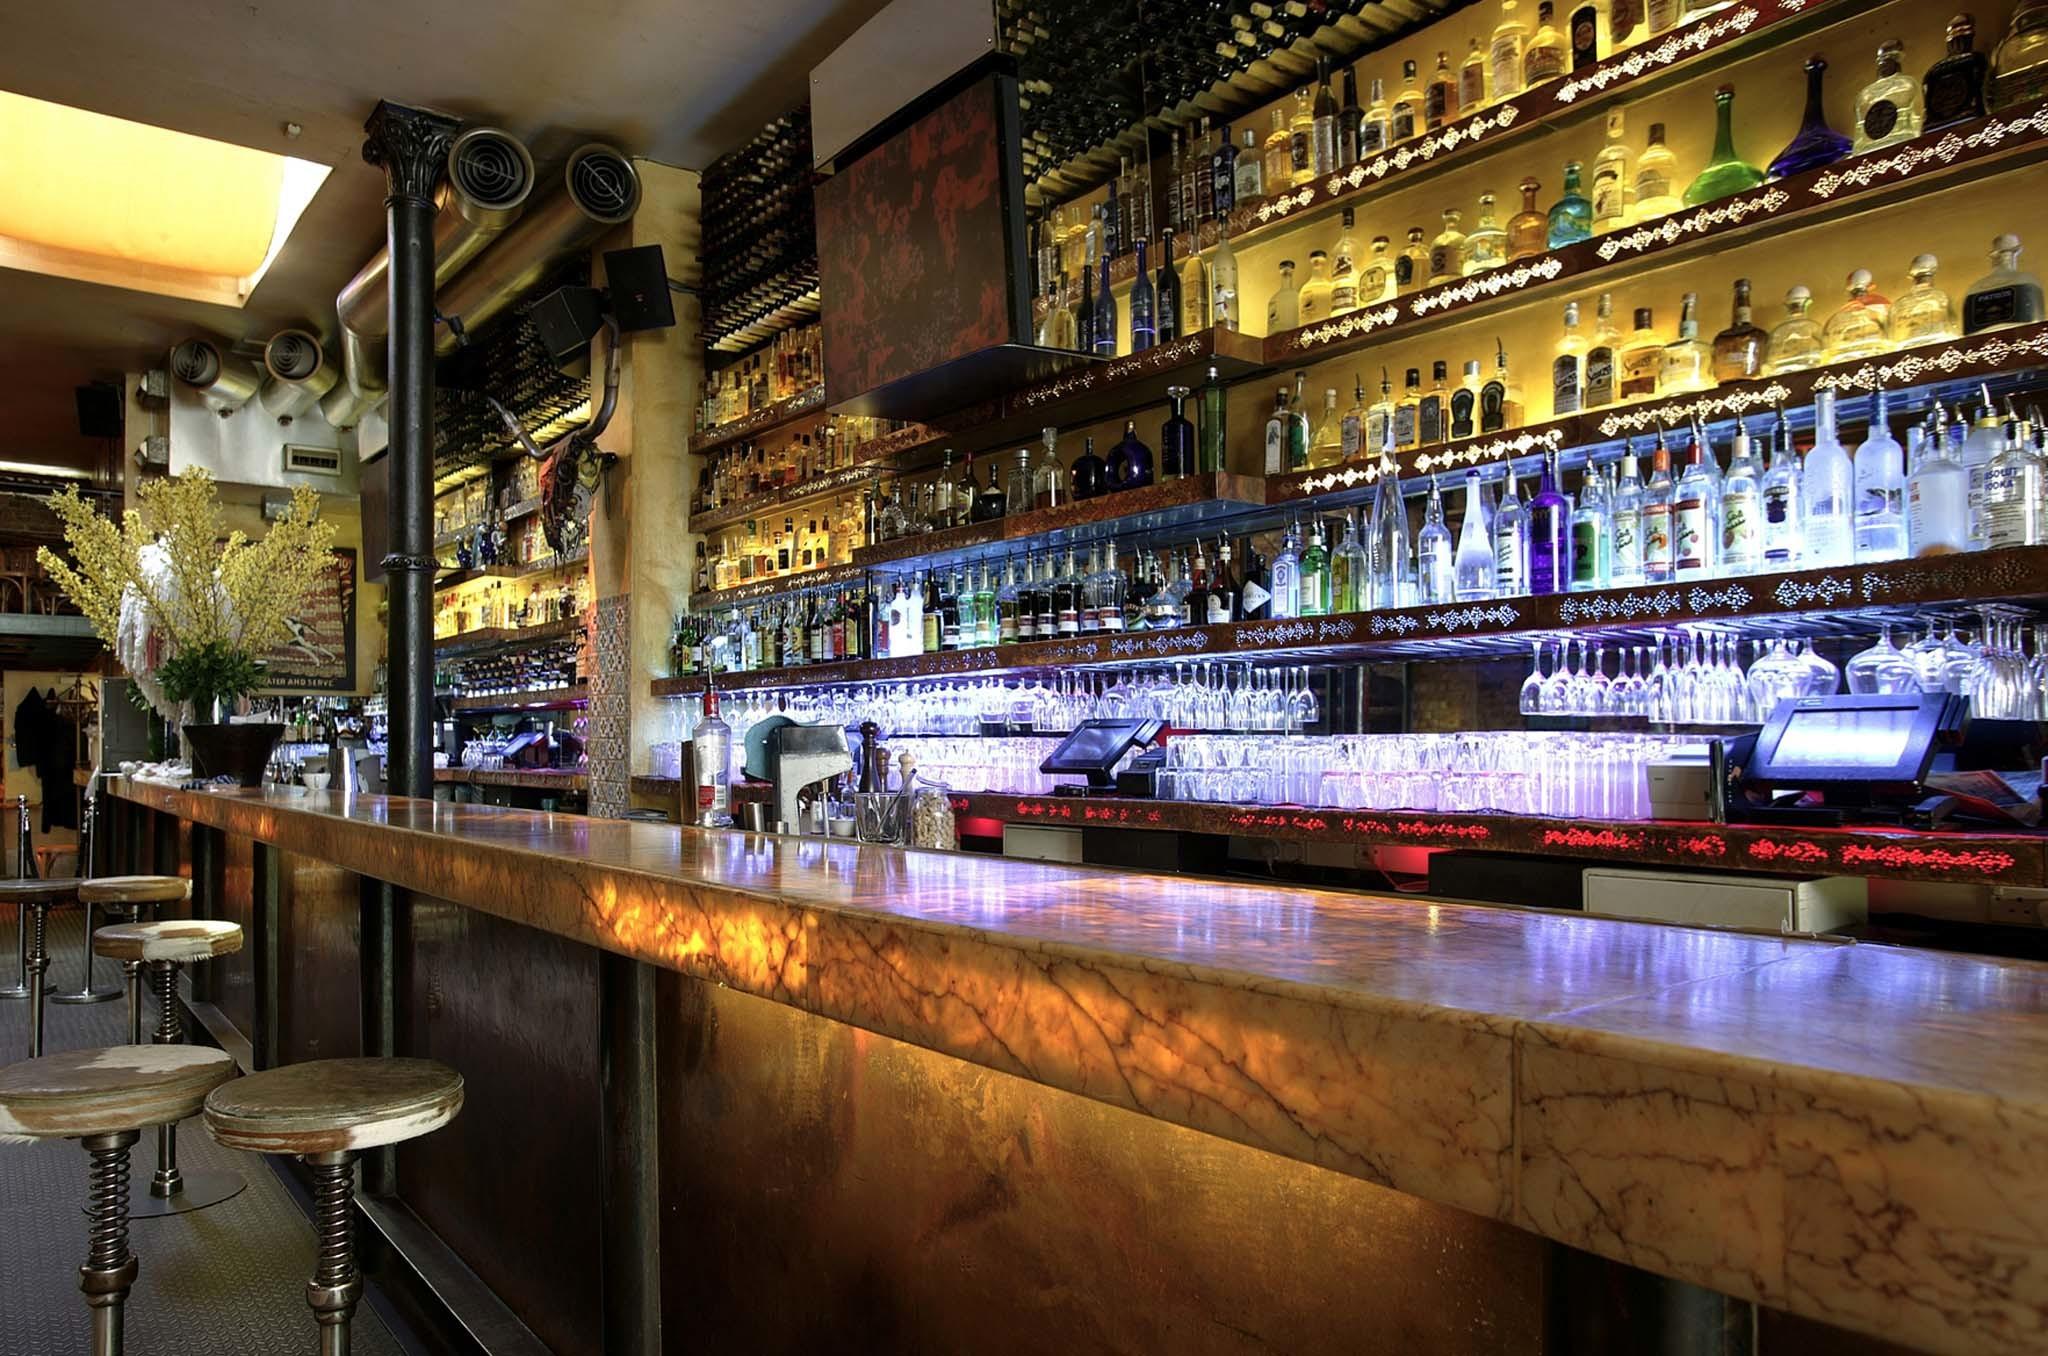 Joe's Southern Table & Bar   Restaurants in Covent Garden, London